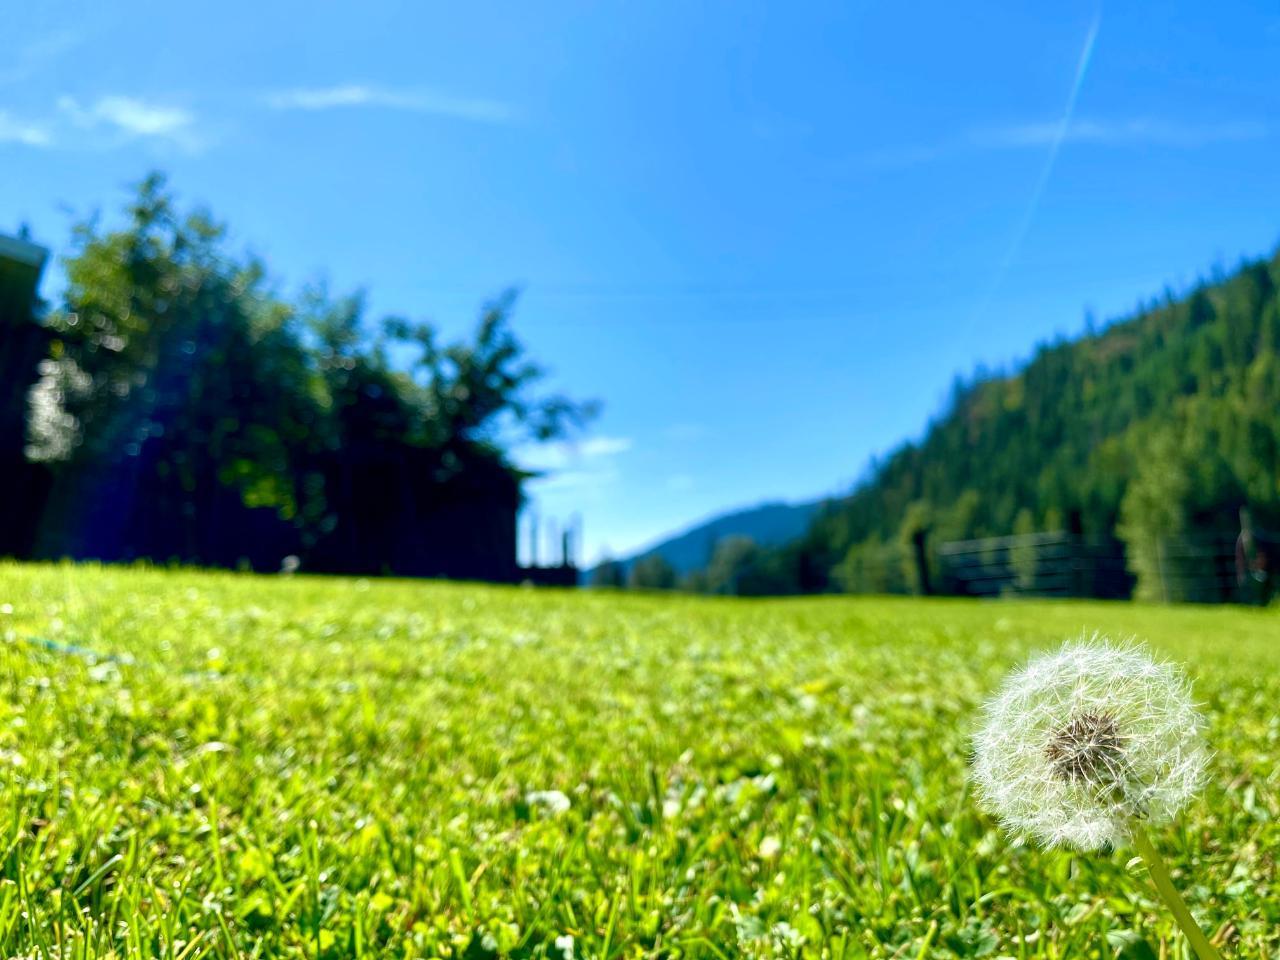 2505 Barley Road, Rossland, British Columbia  V0G 1Y0 - Photo 43 - 2461148